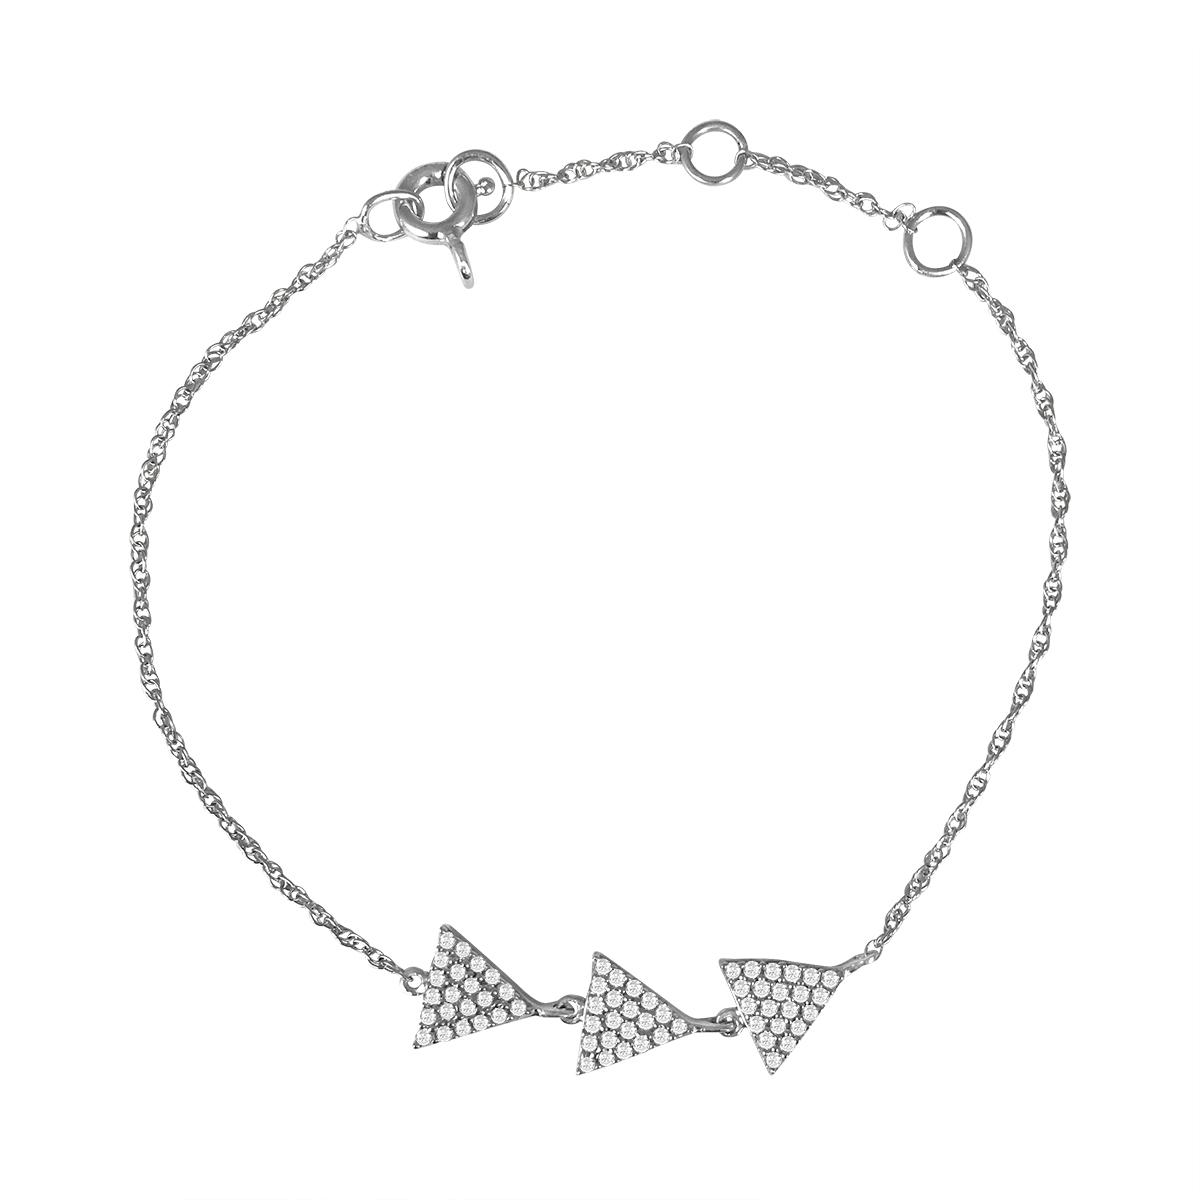 1/3 Carat TW Diamond triple Triangle Bracelet in 10K White Gold